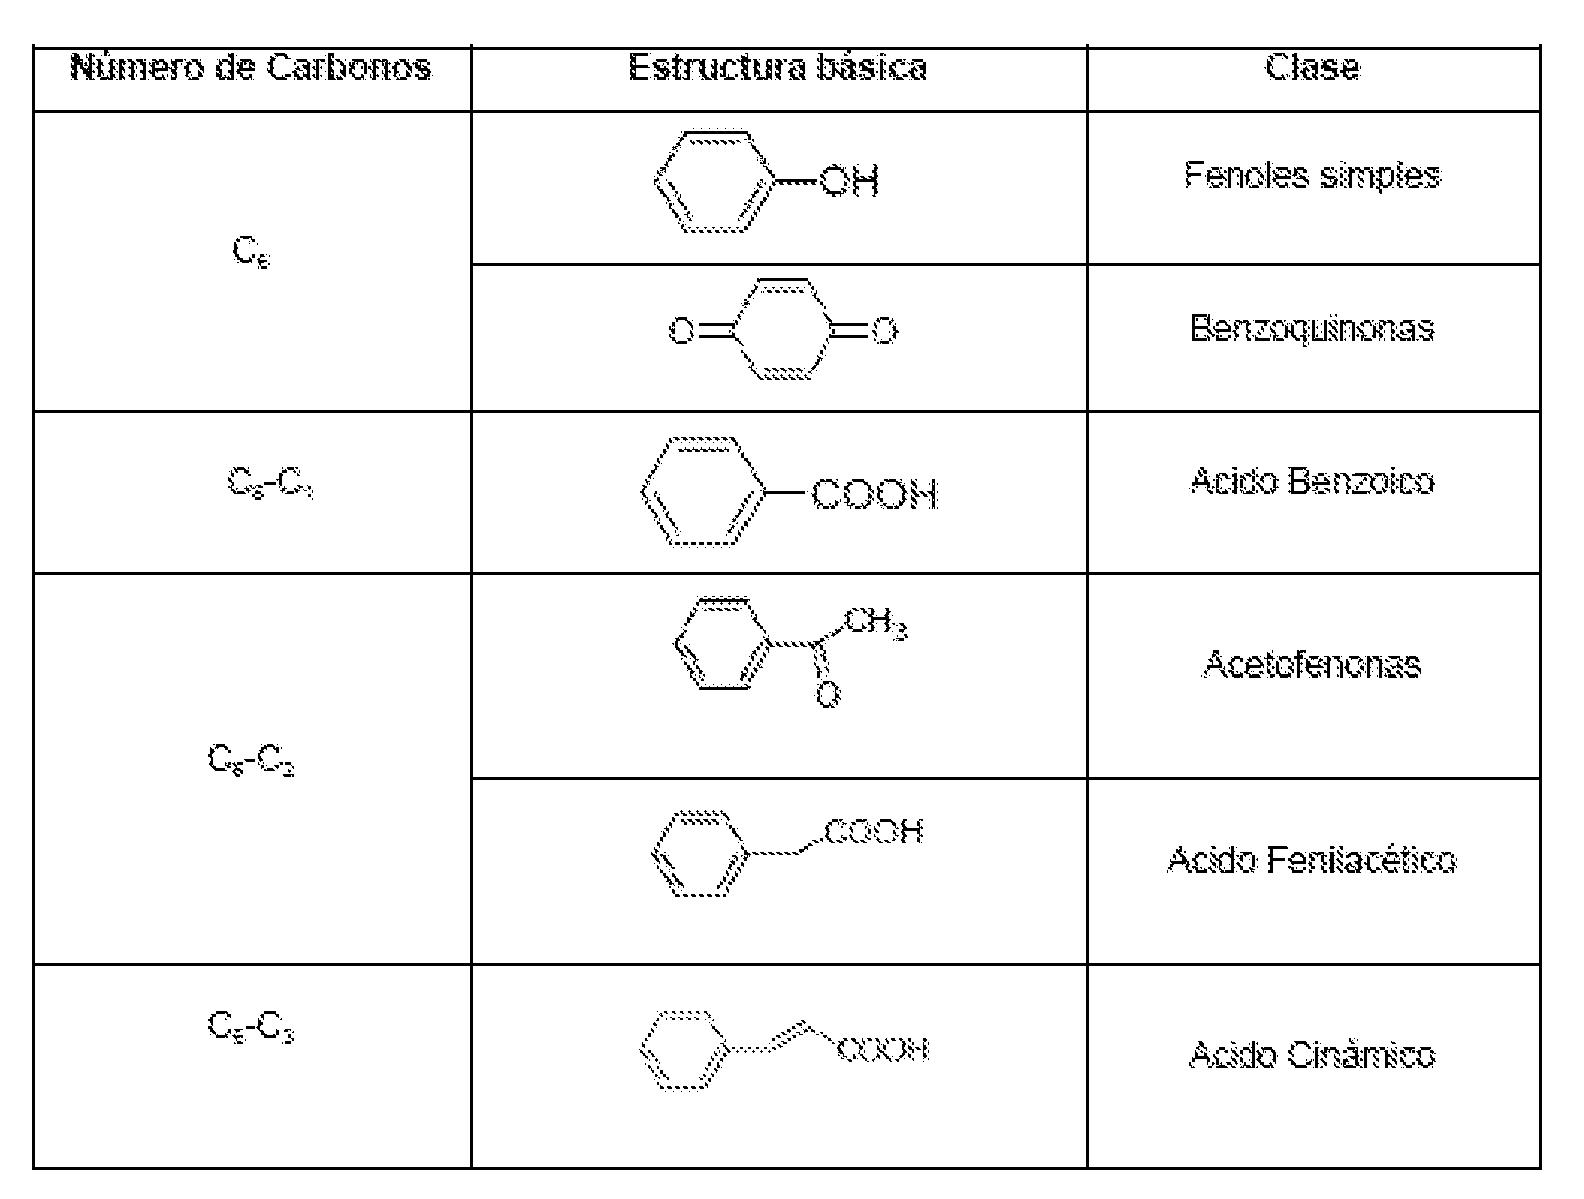 Diabetes del ácido cafeico 3 glucósido